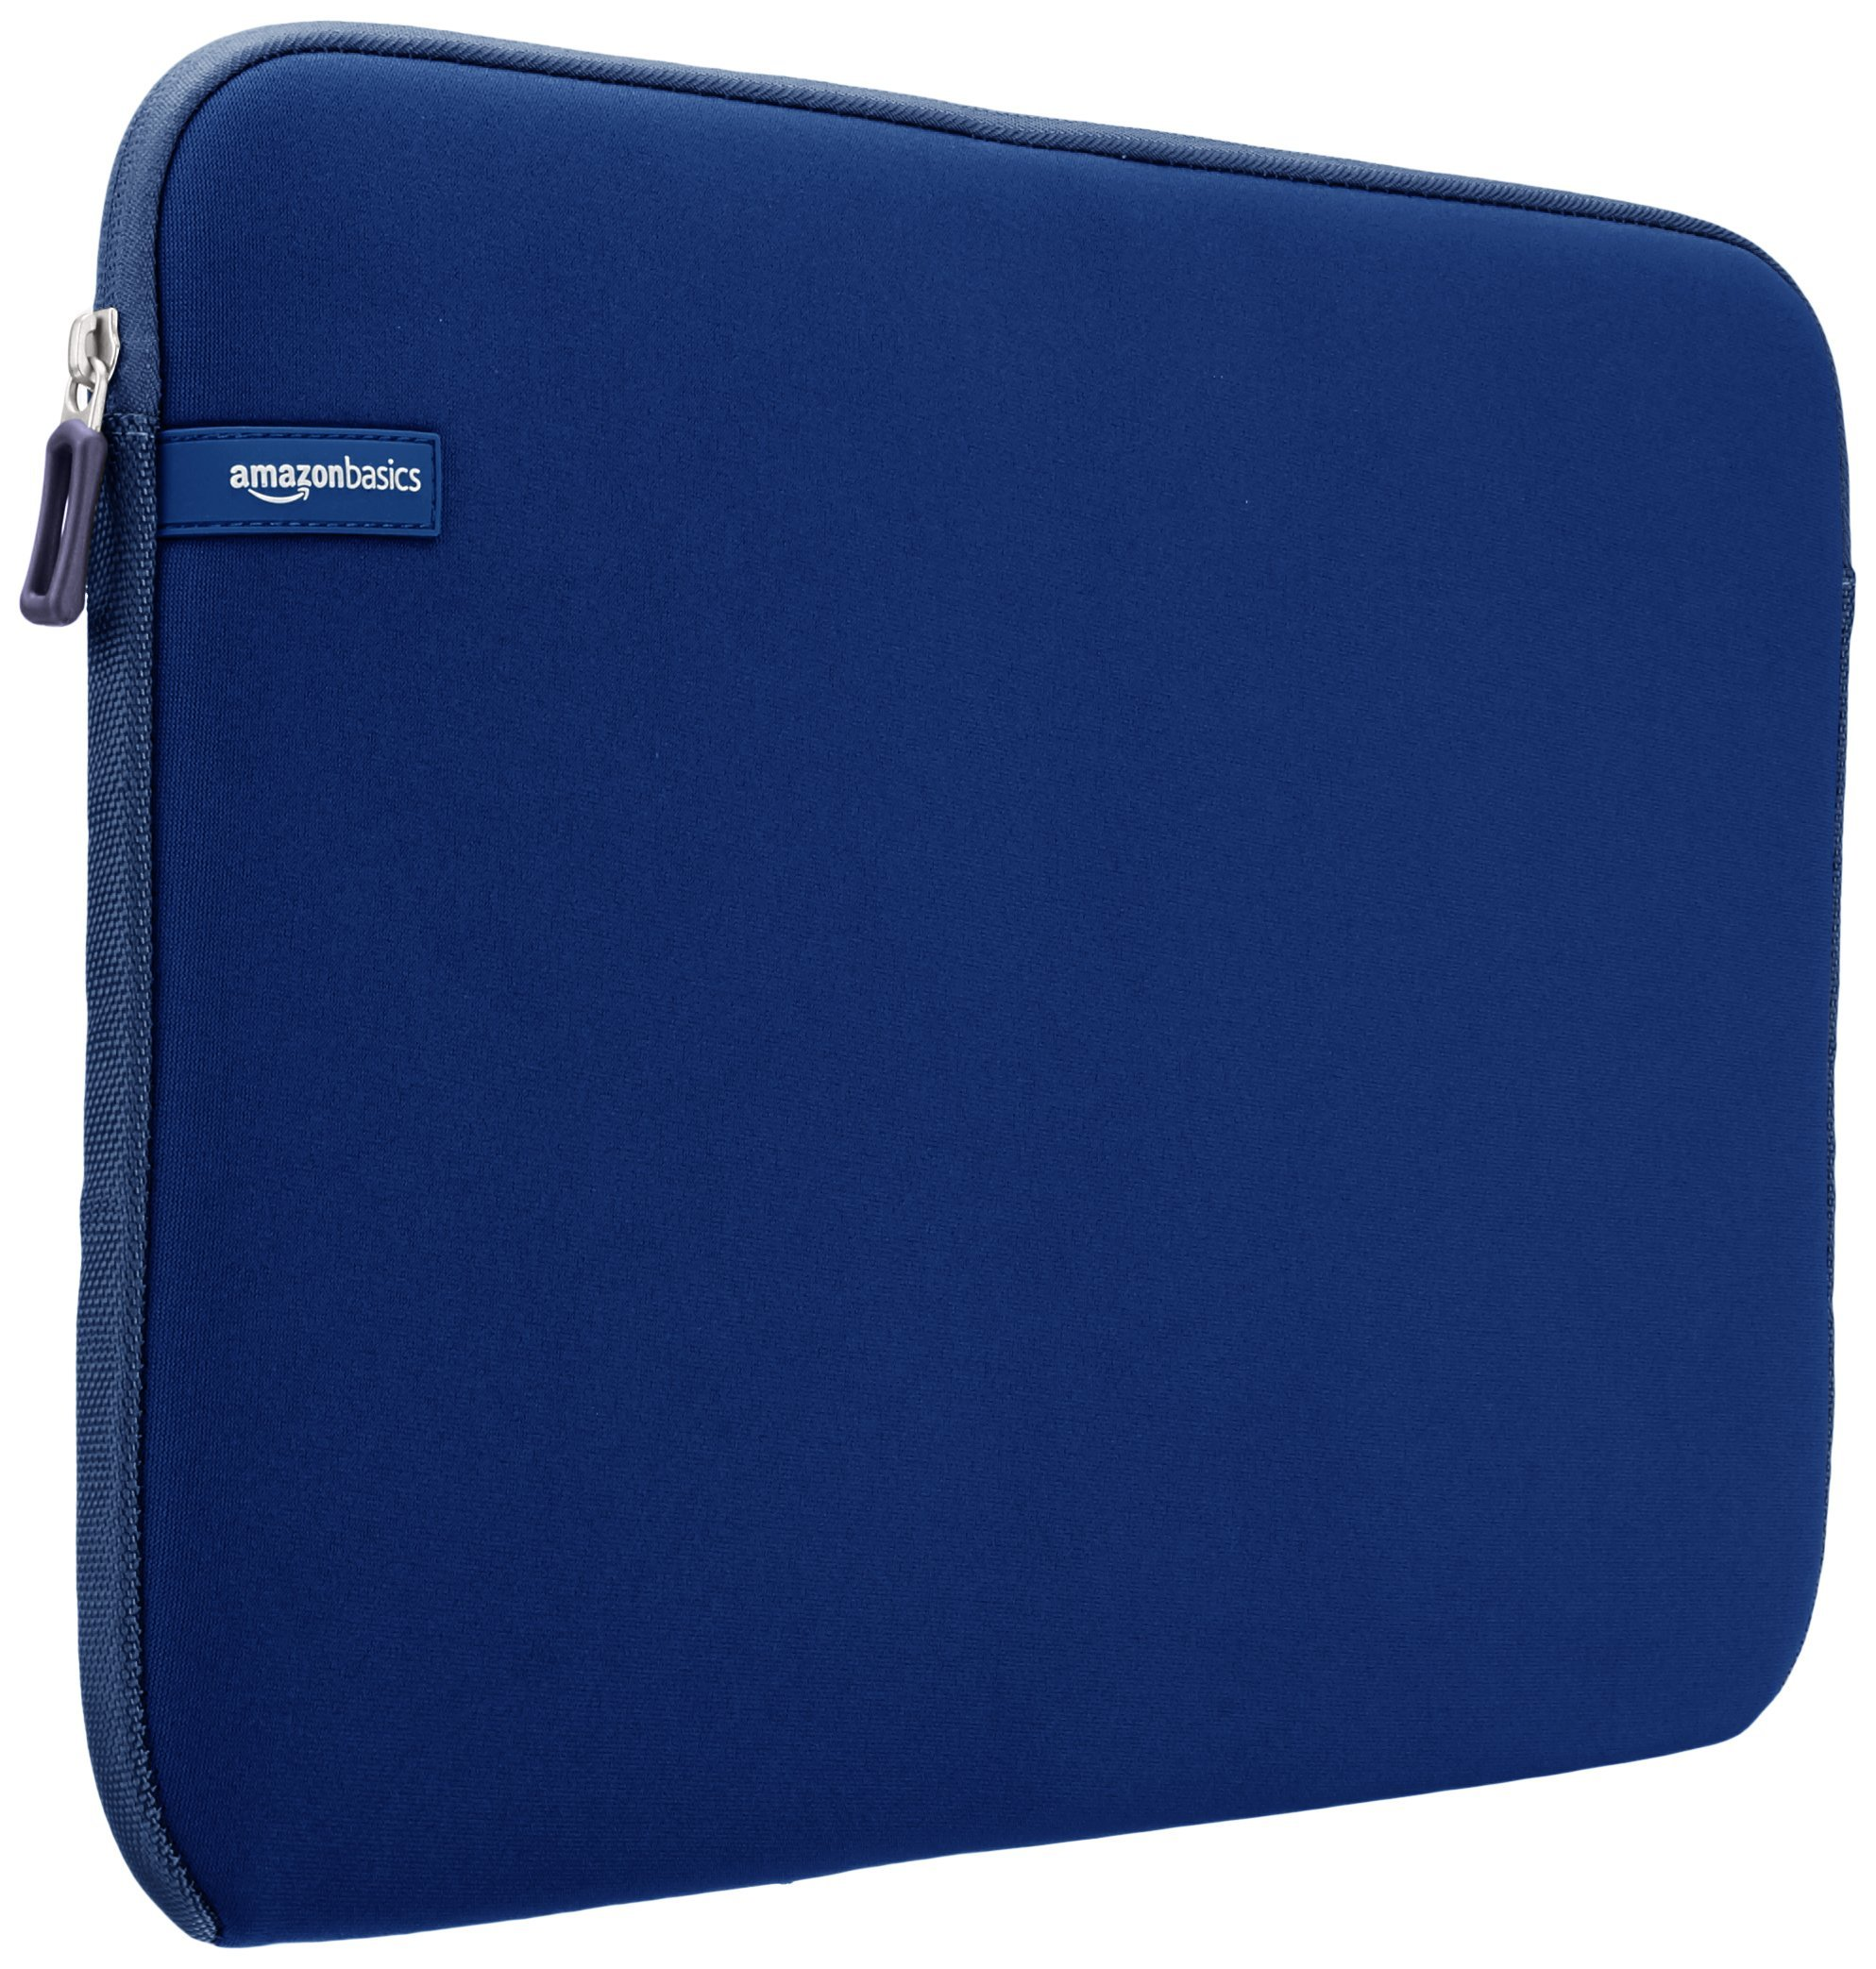 AmazonBasics 15.6 Inch Laptop Computer Sleeve Case - Navy 1-